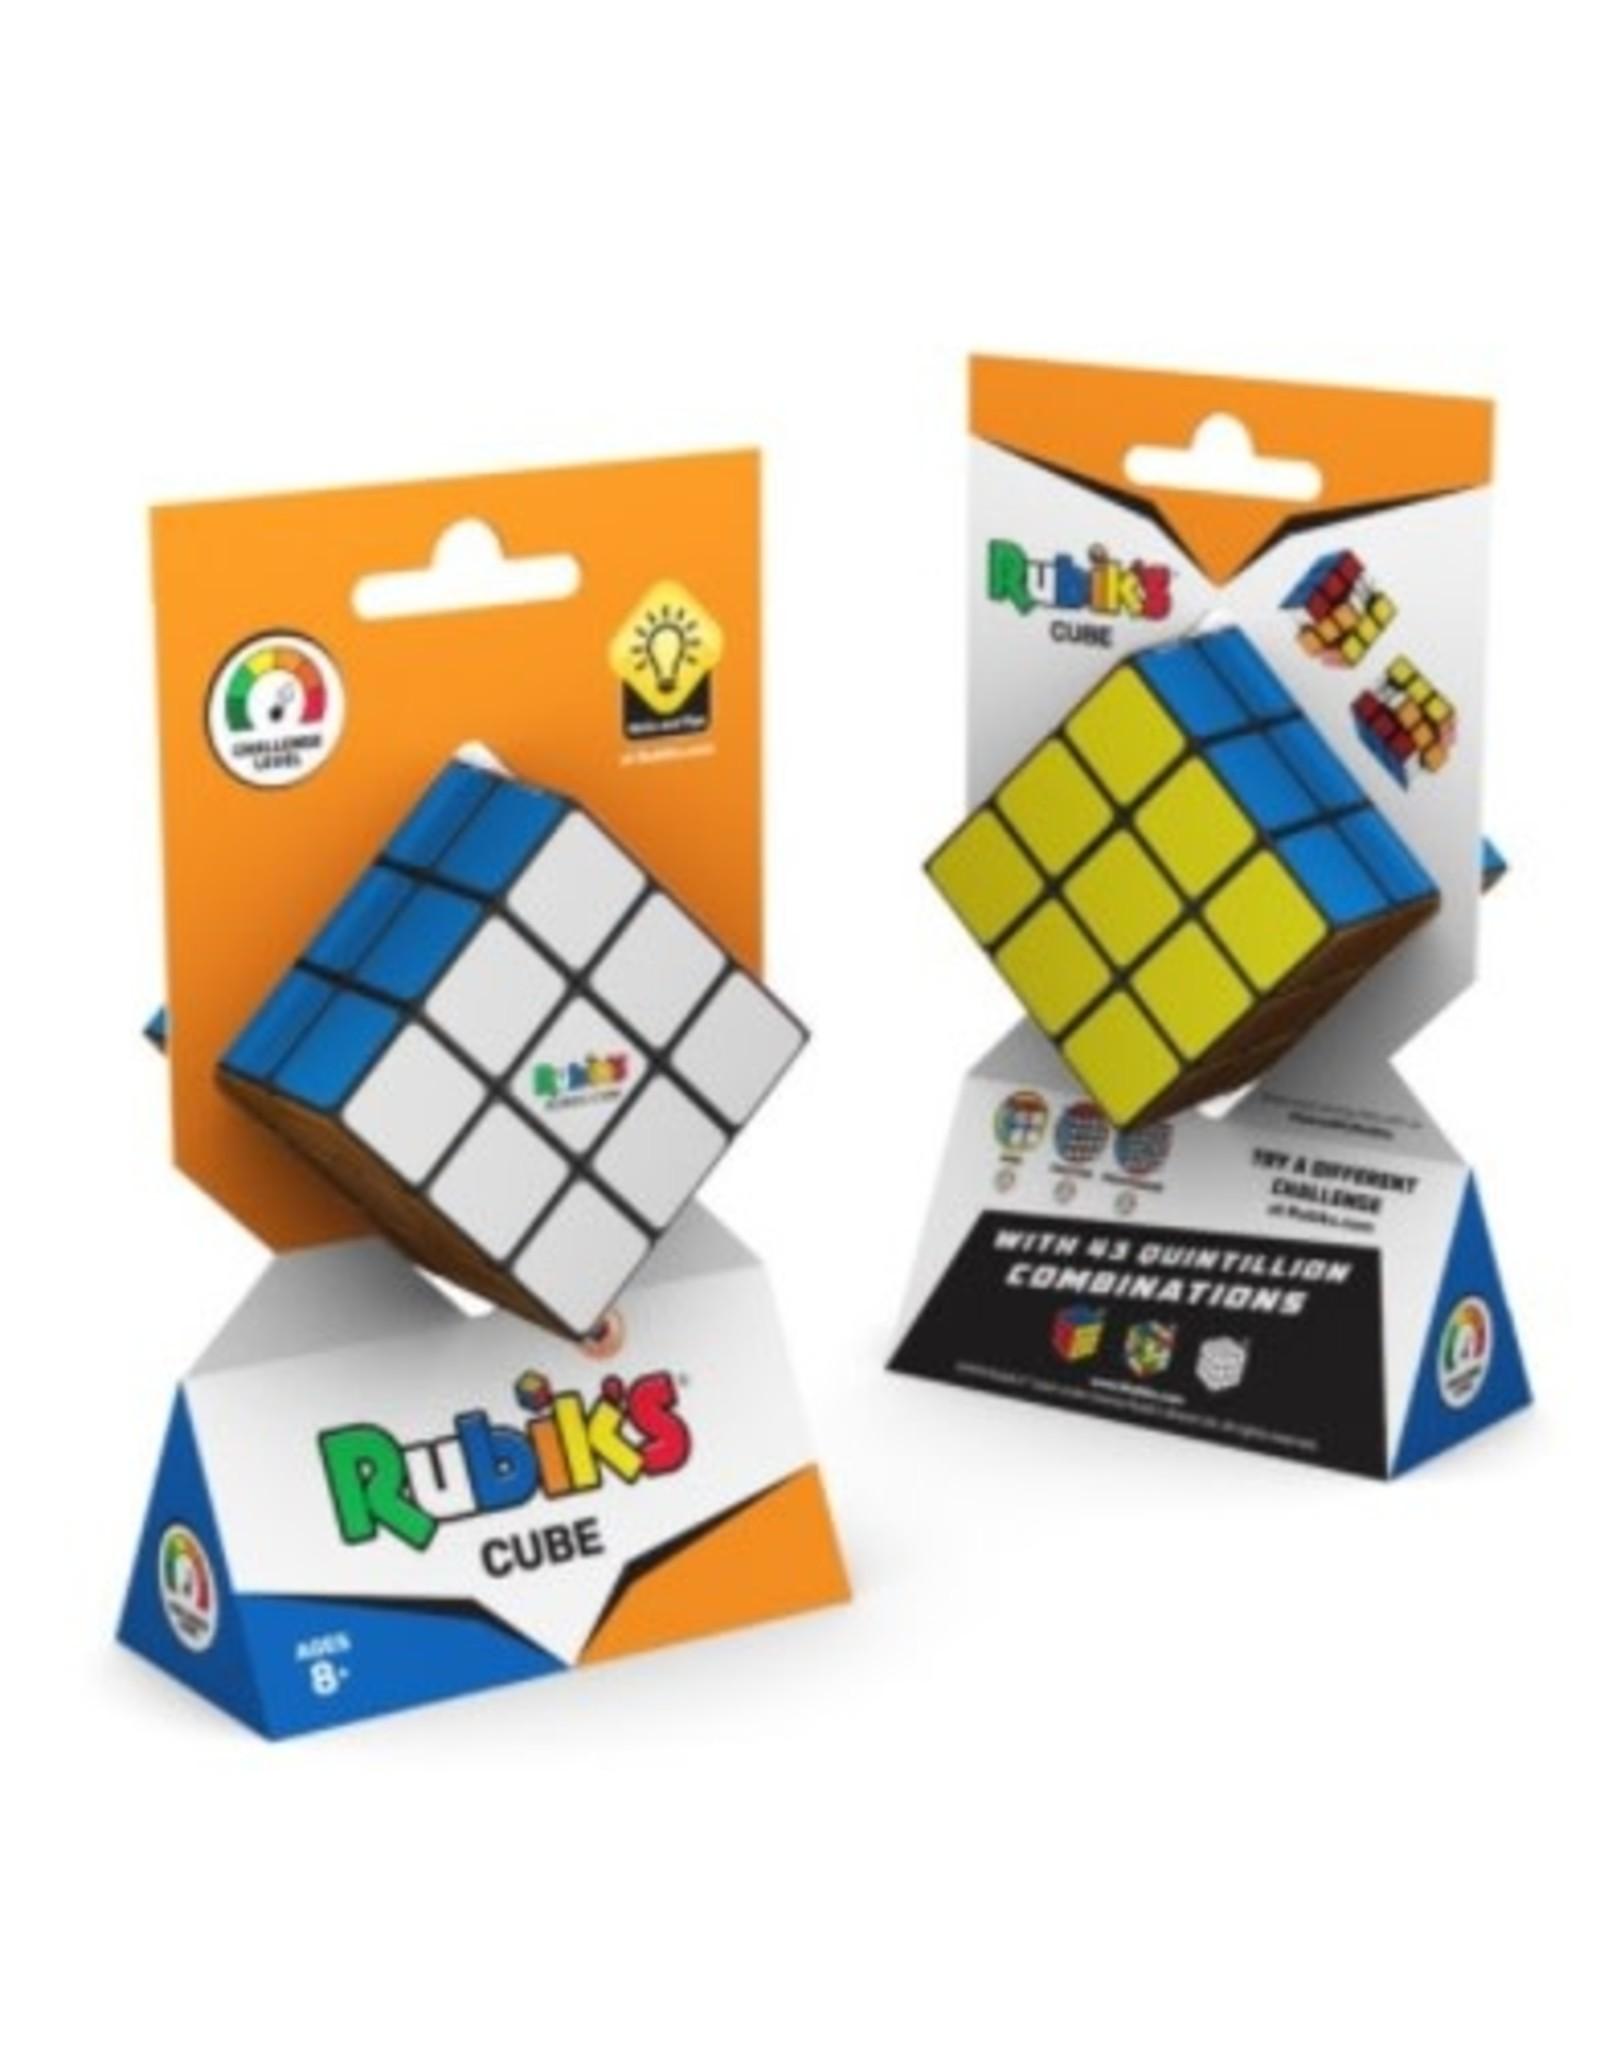 Rubik's Rubik's Cube - 3X3